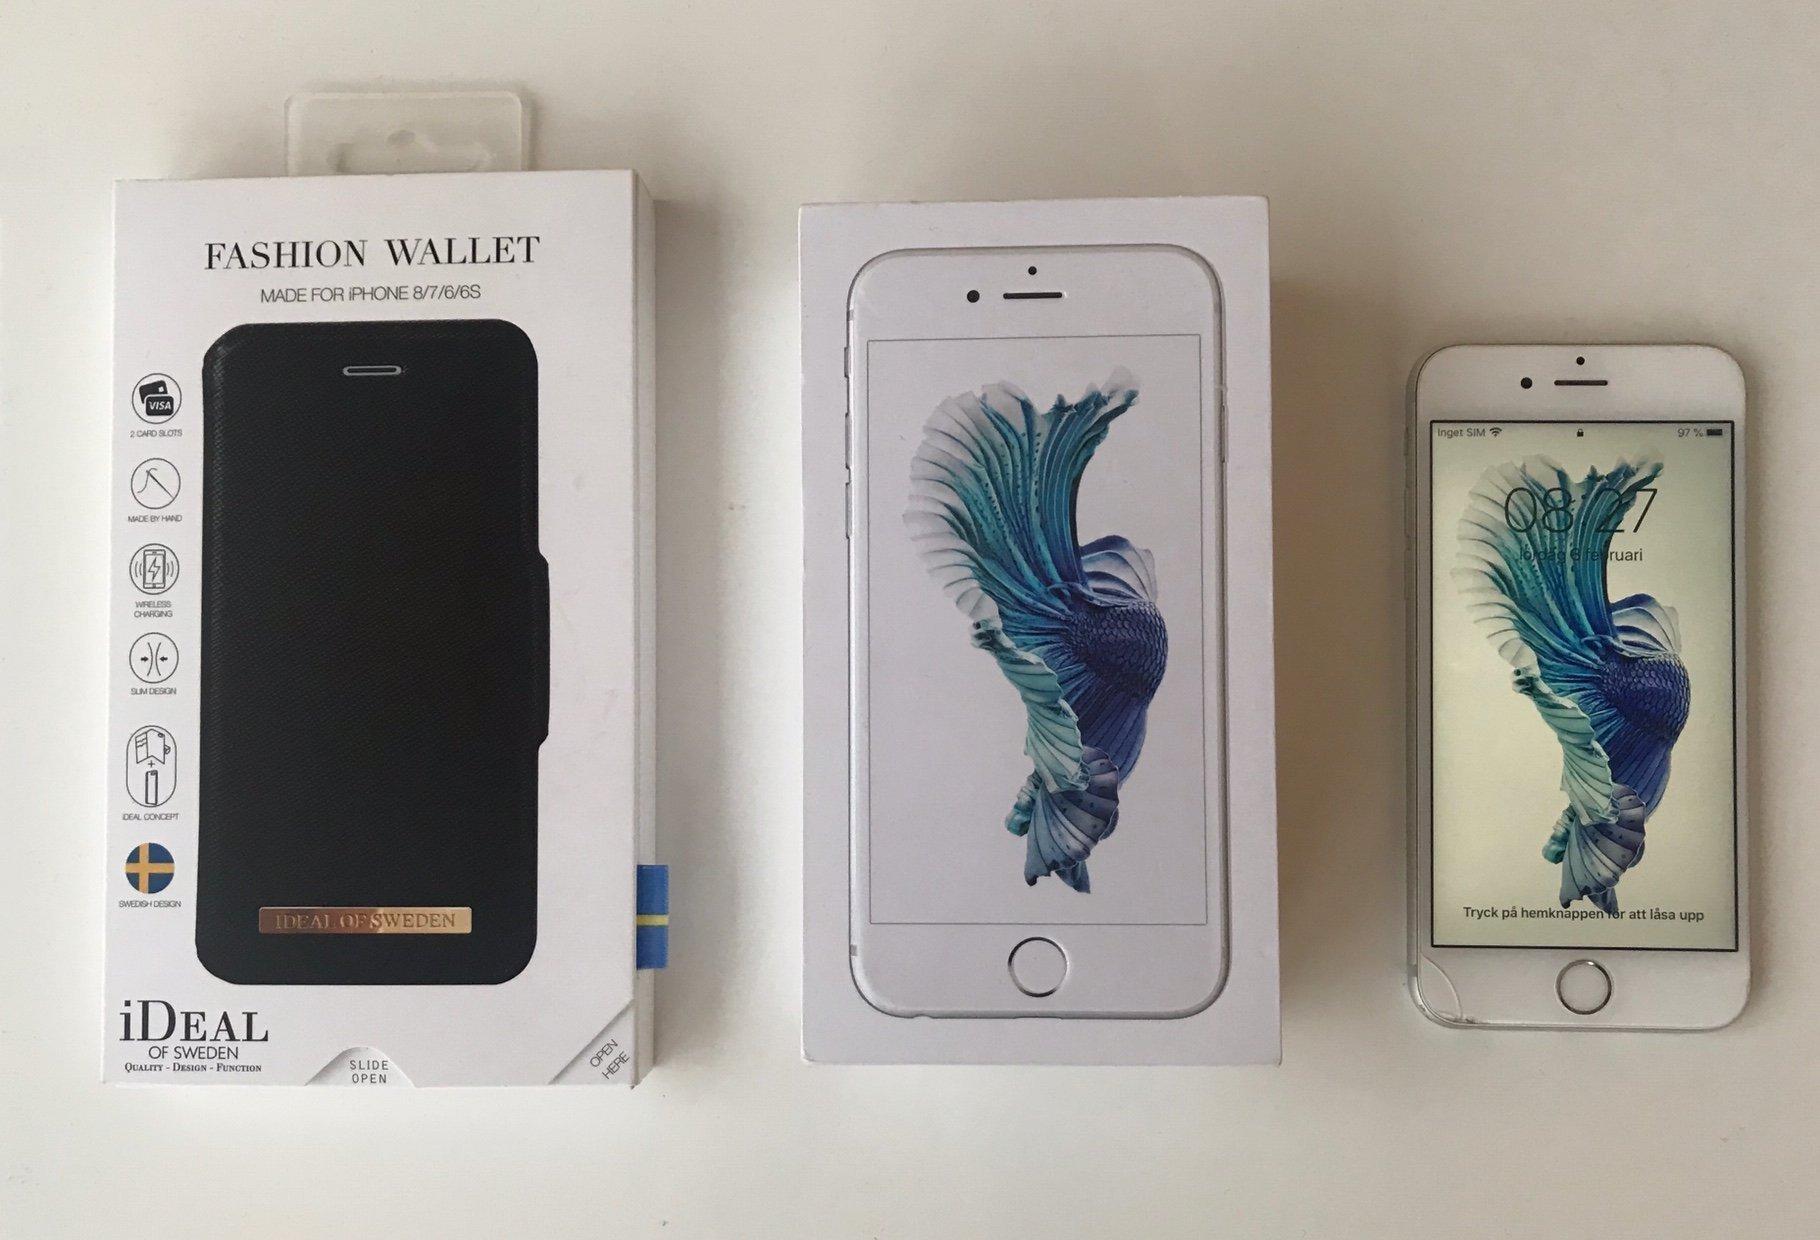 iPhone 6S Silver Vit 16GB Apple Mobiltelefon + Laddare